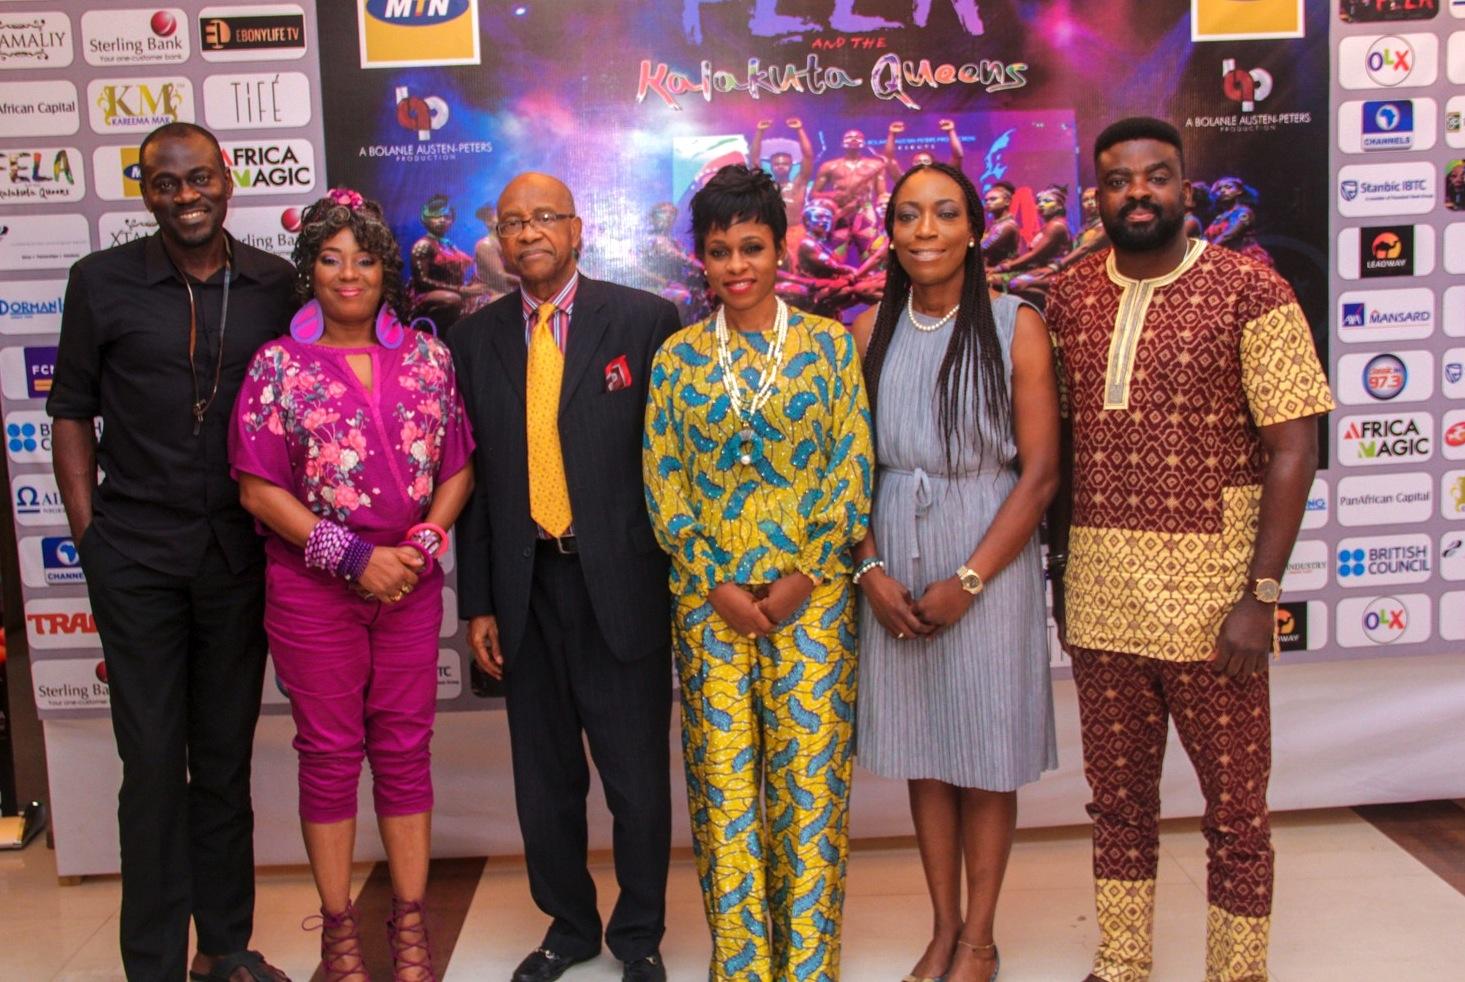 African Arts with Taj: 'Fela and the Kalakuta Queens